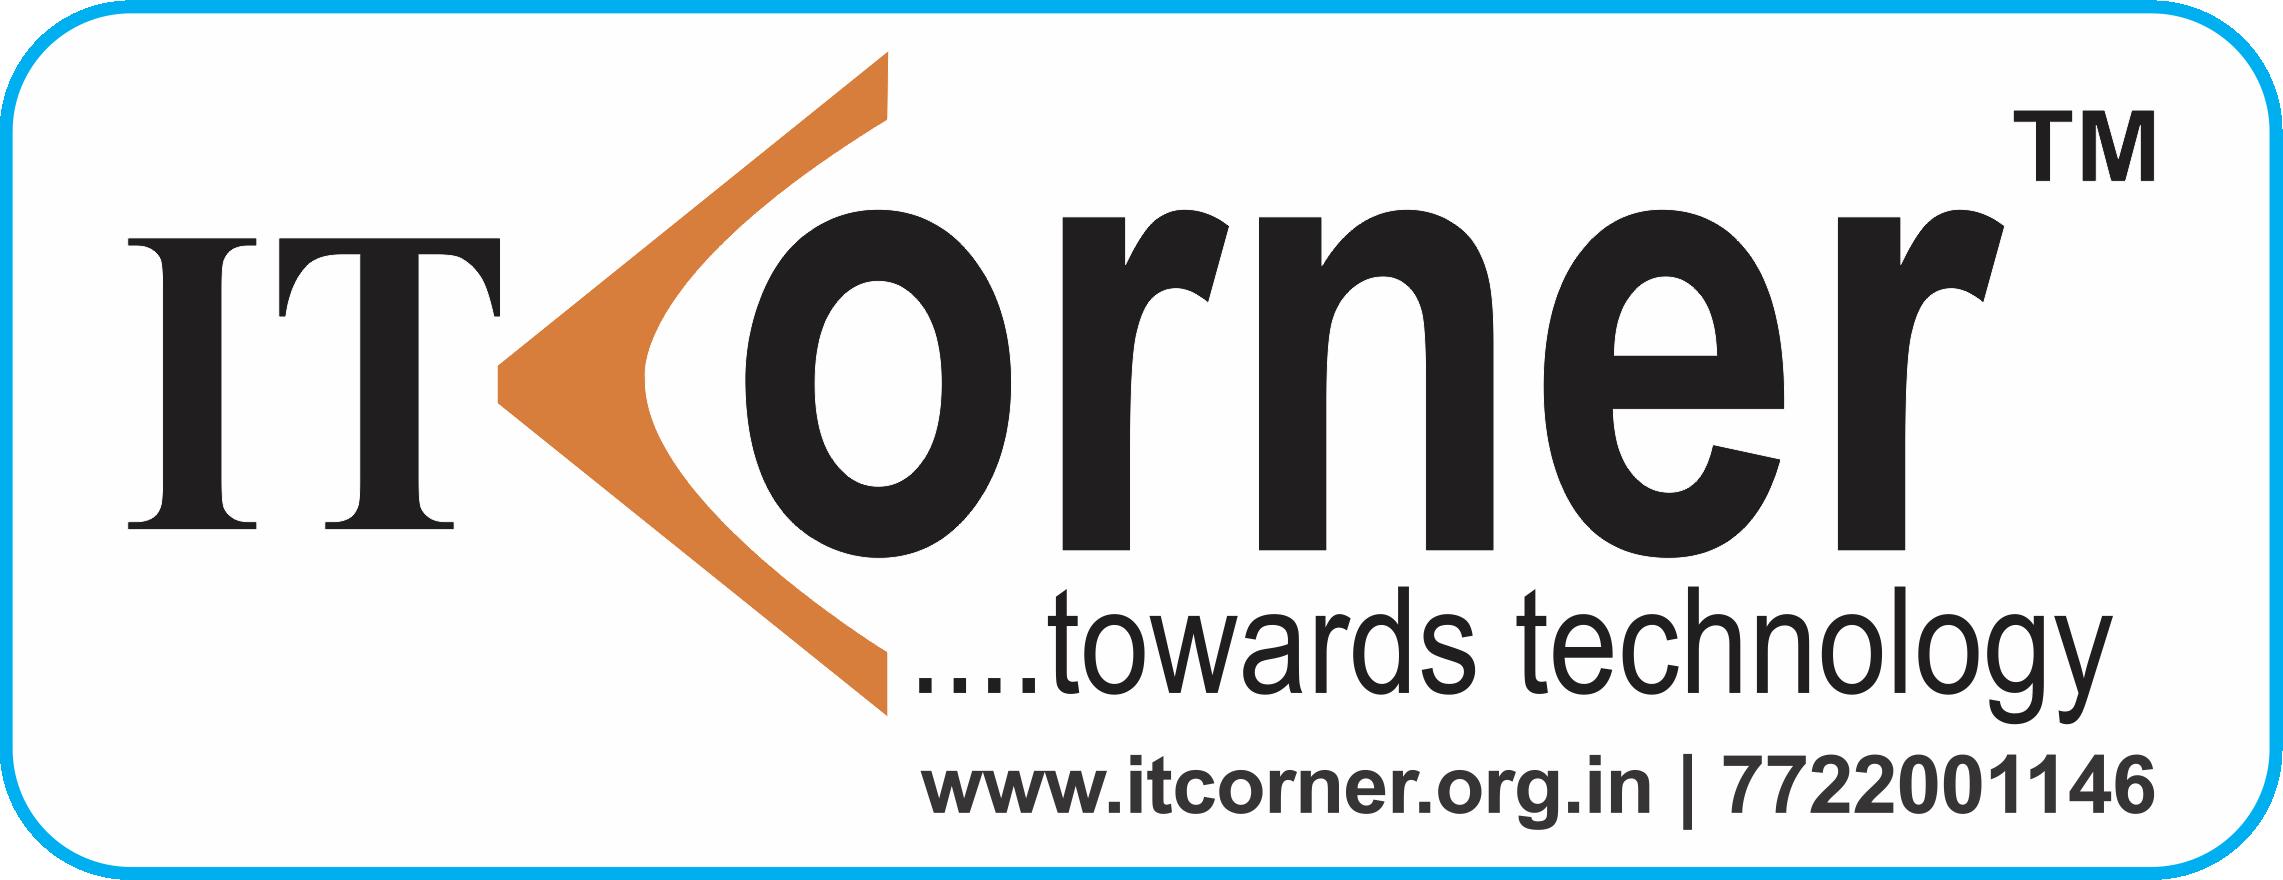 ITCORNER Share Business Card